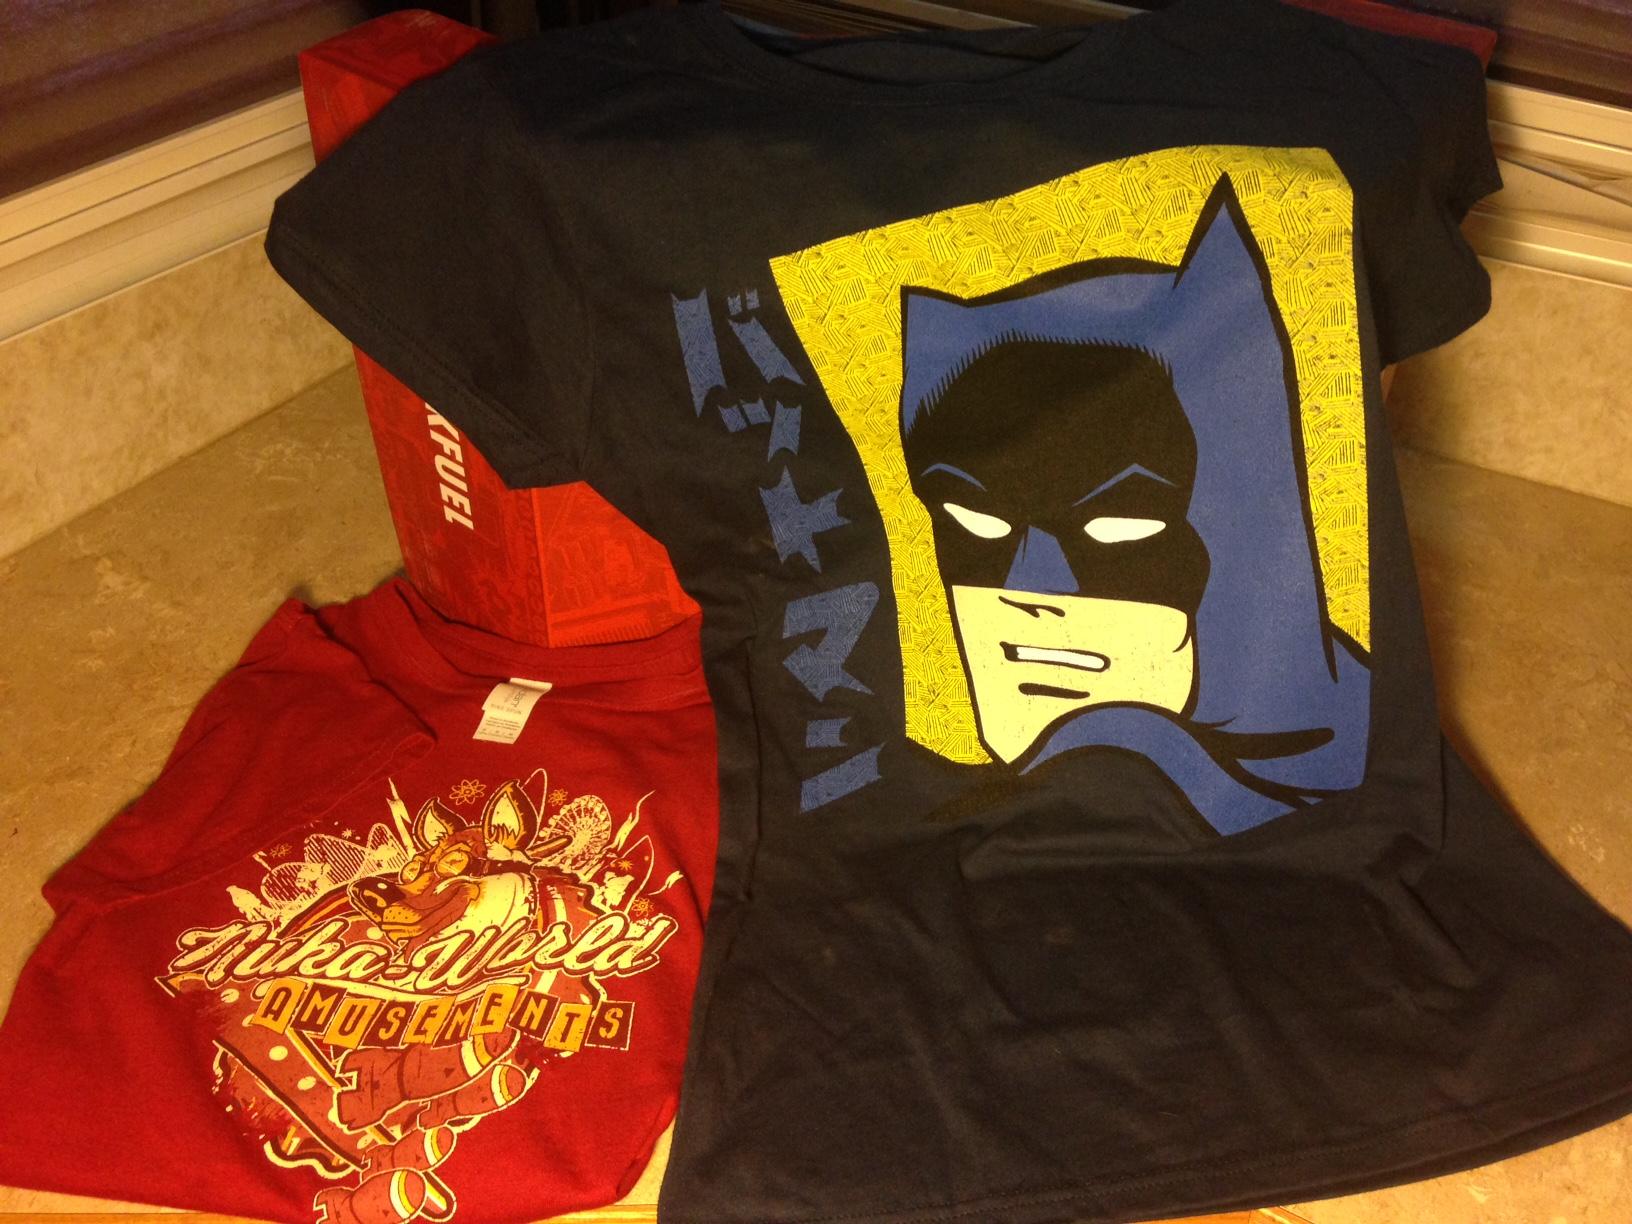 Geek Fuel T-shirts